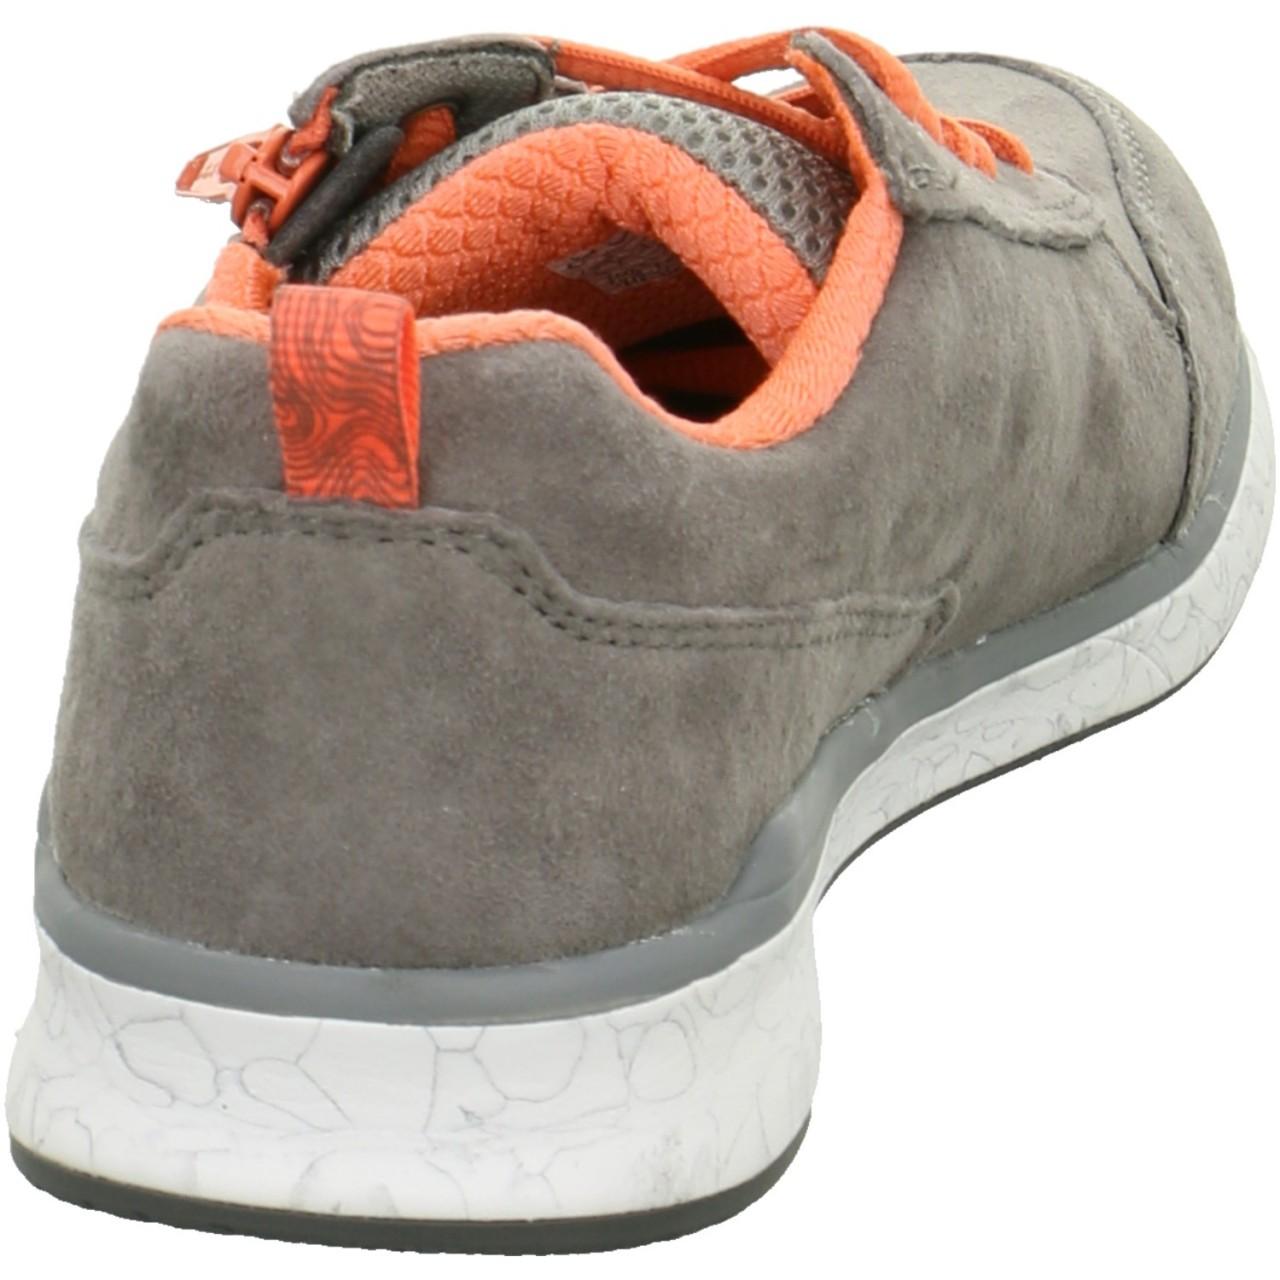 Vado Mädchen Sneaker Grau 406 Ash Chay